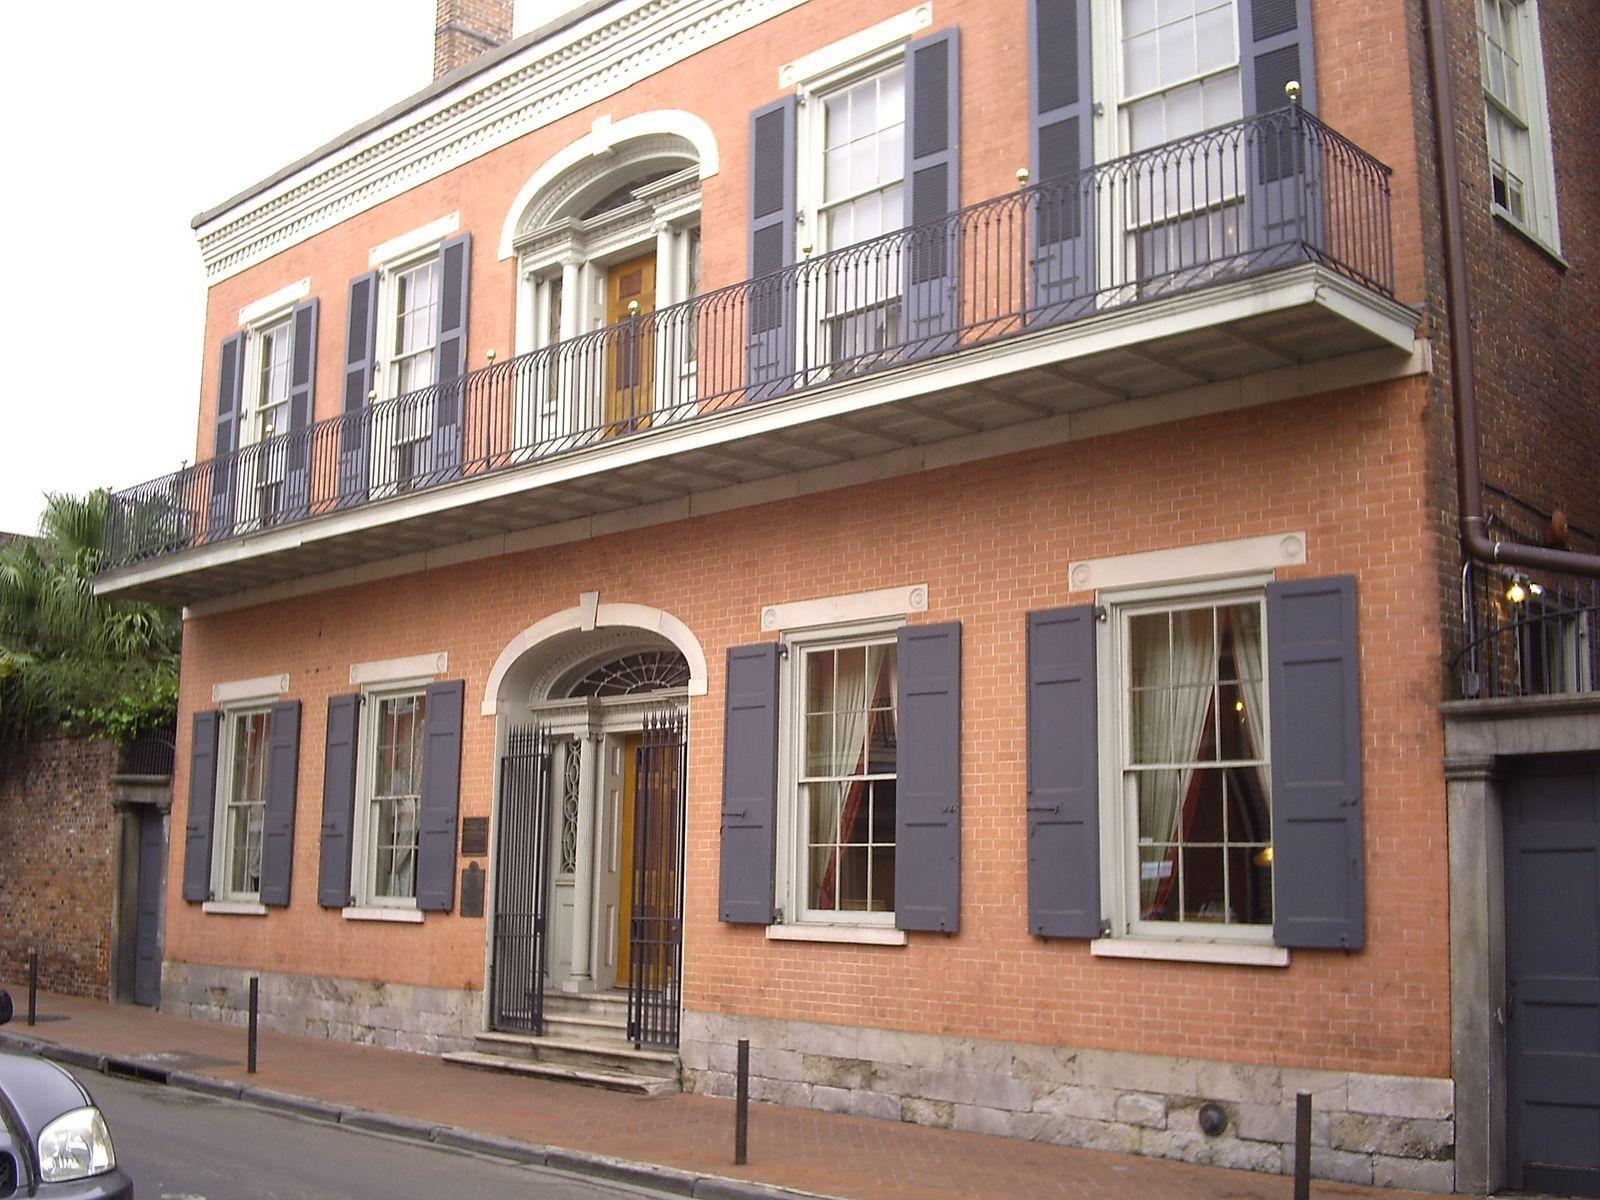 Hermann-Grima House exterior